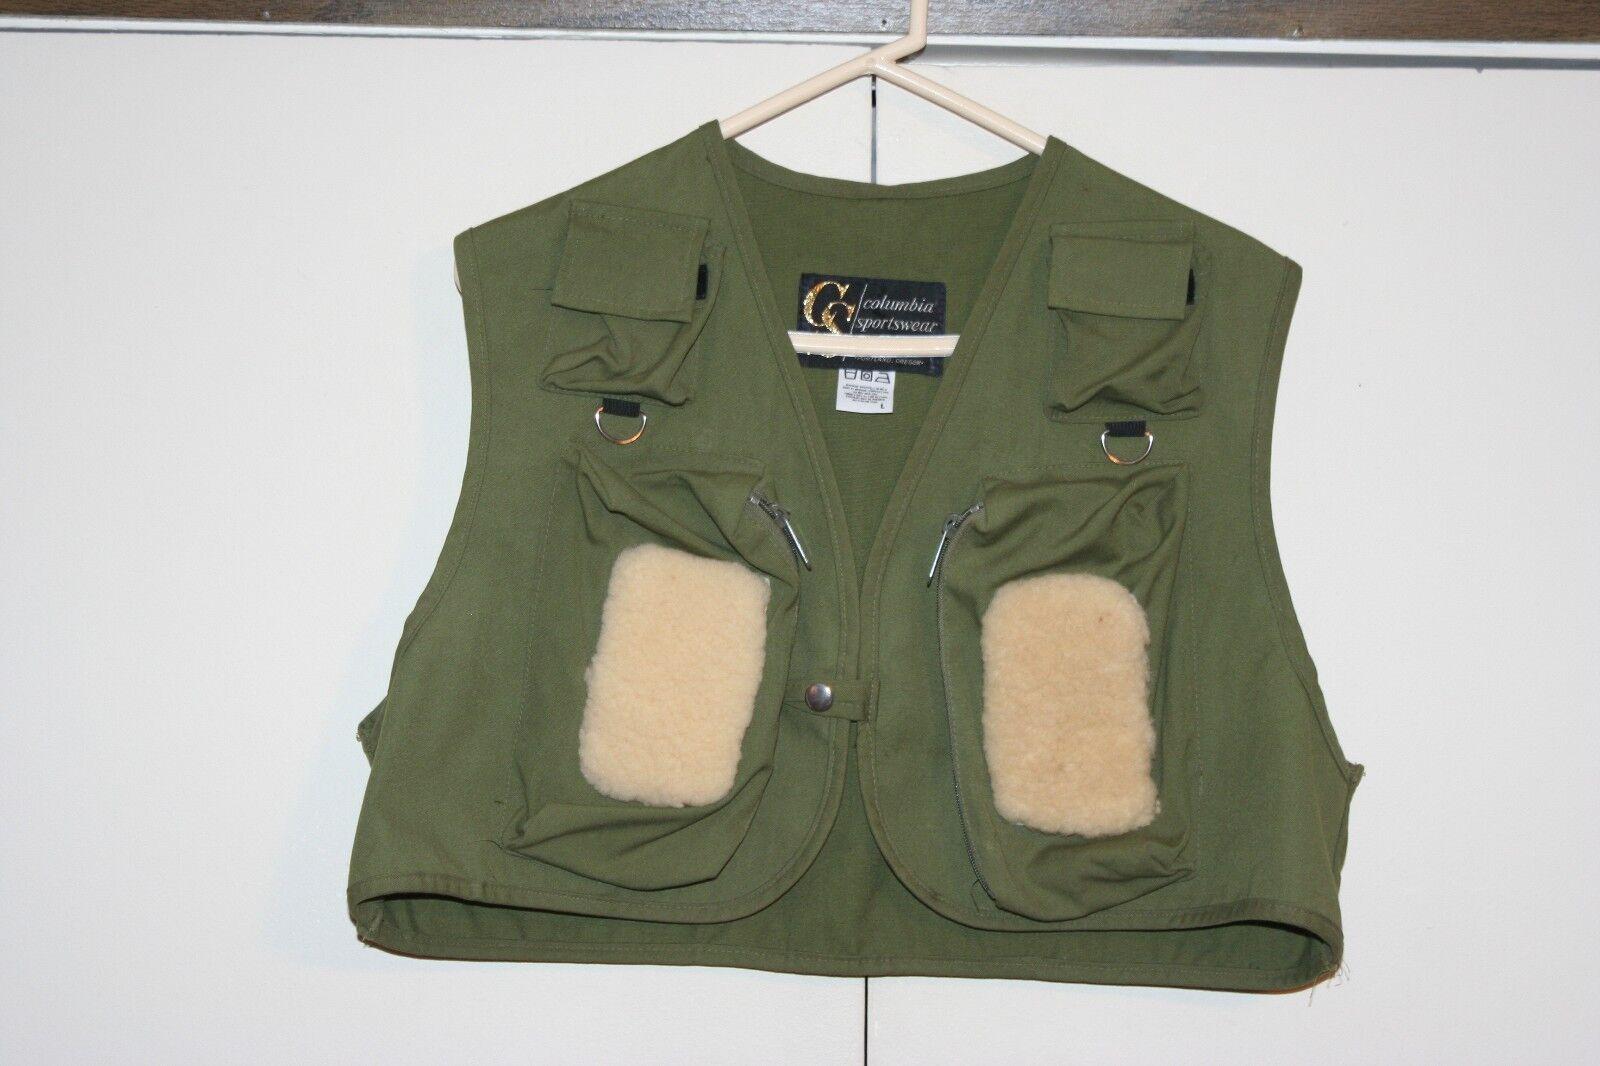 Columbia Sportswear Portland OR USA VTG Fly Fishing Vest Size Large Multi Green